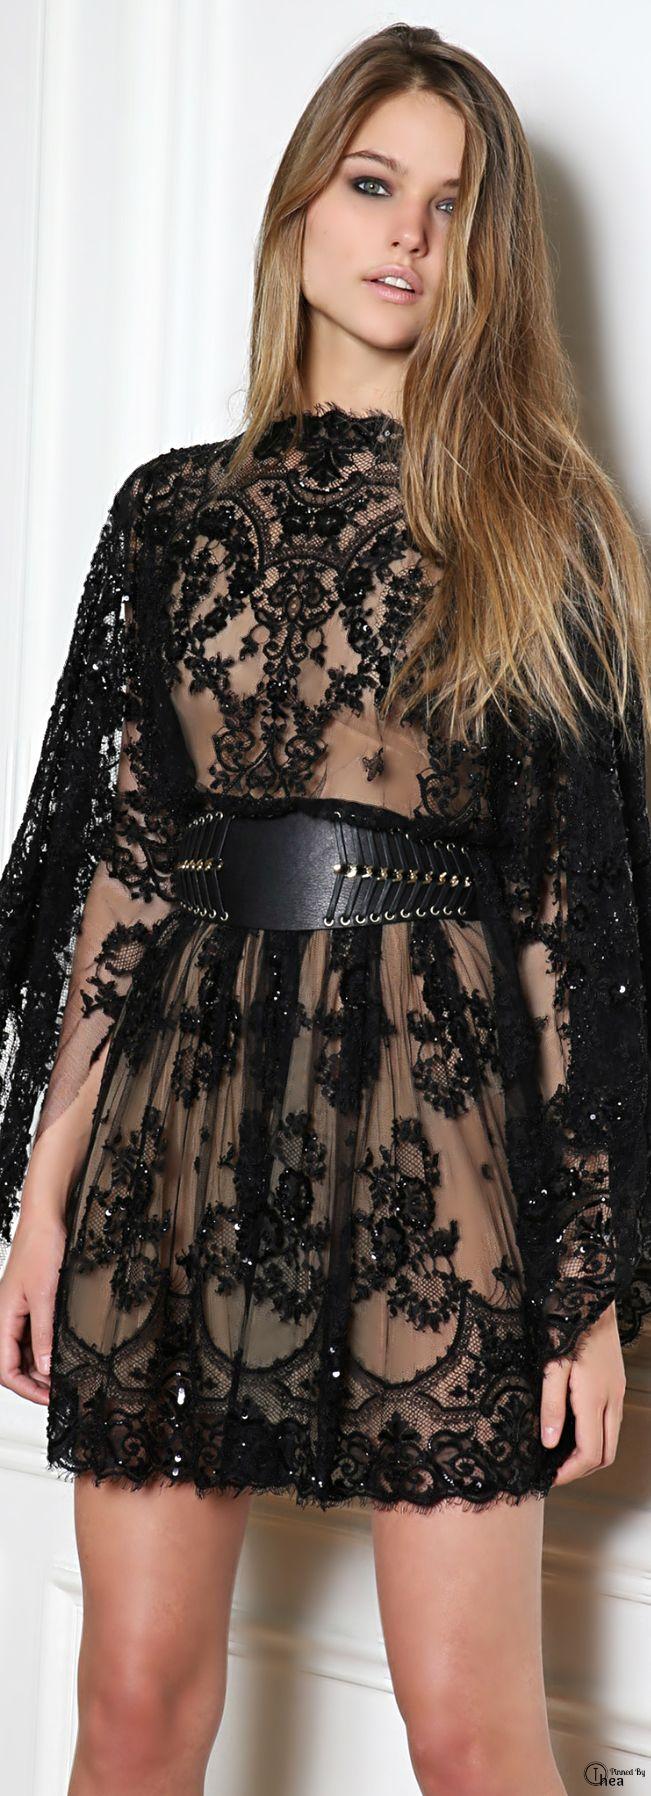 Zuhair Murad ● FW 2014-15 black lace cocktail dress